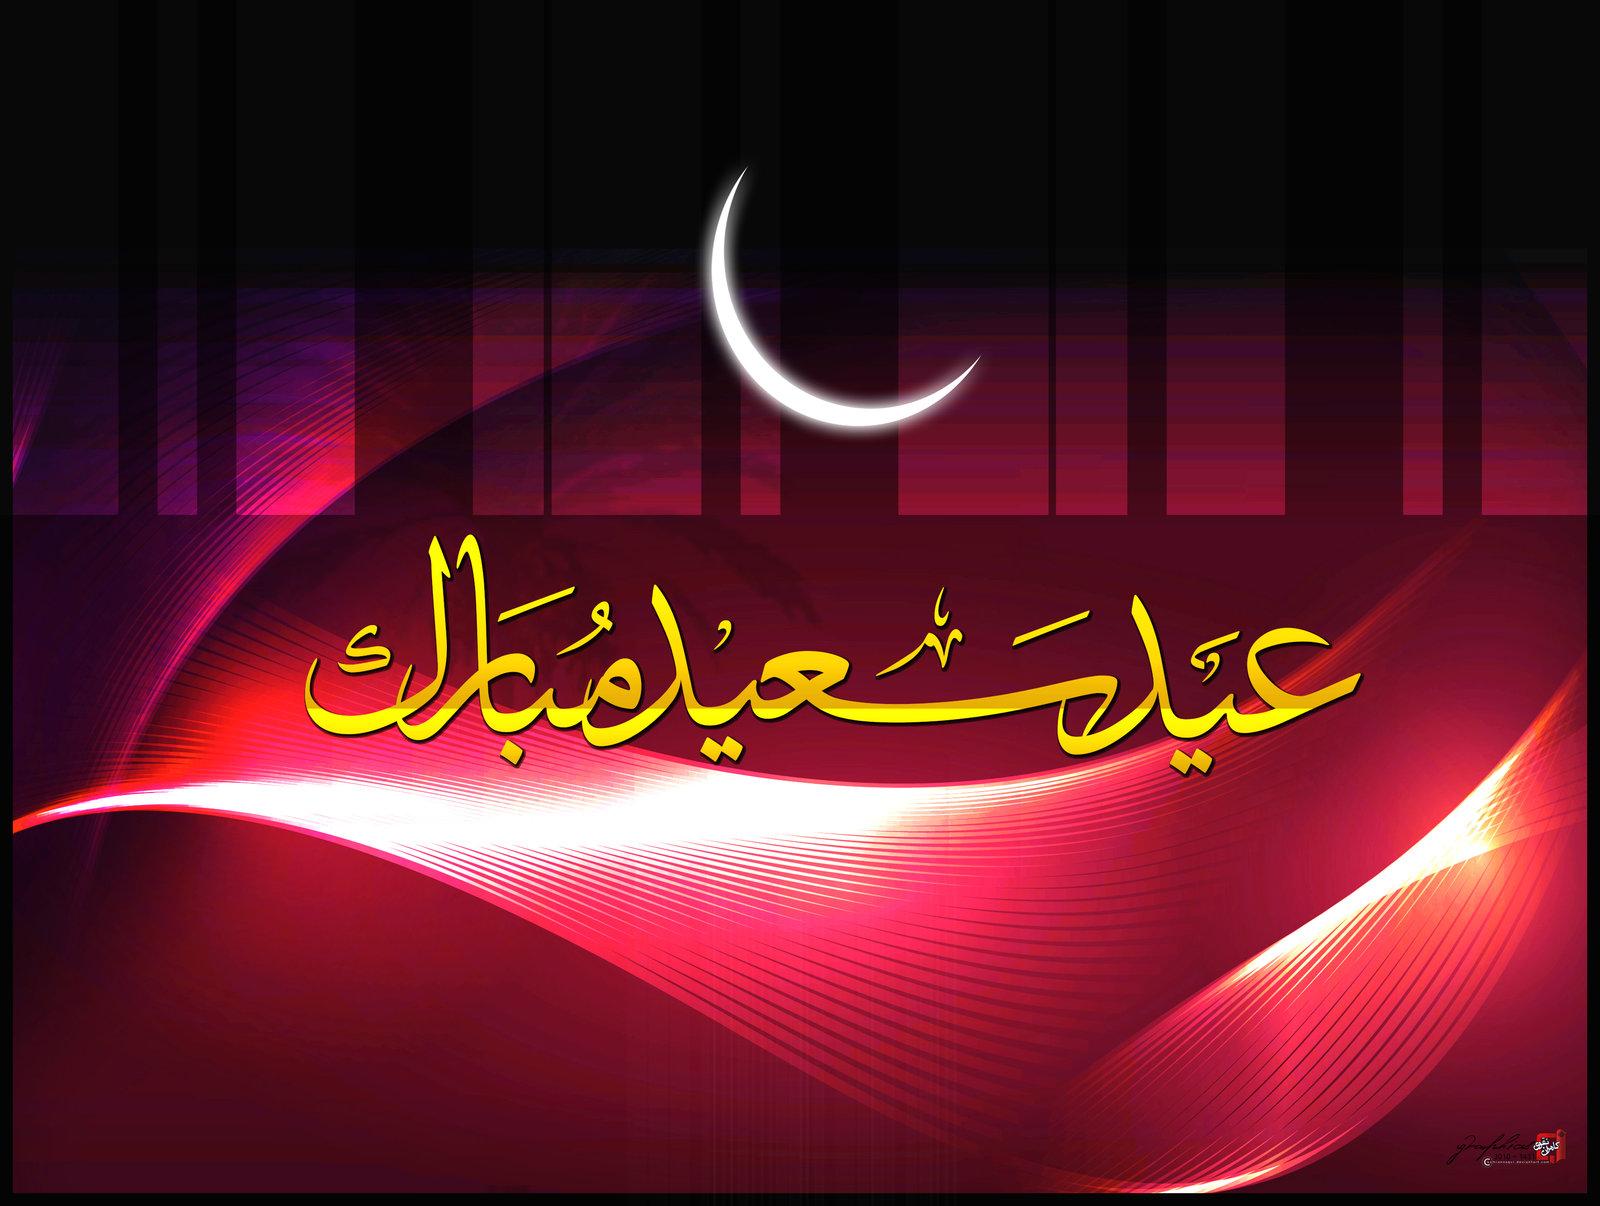 eid mubarik wallpaper hd collection  best hd desktop